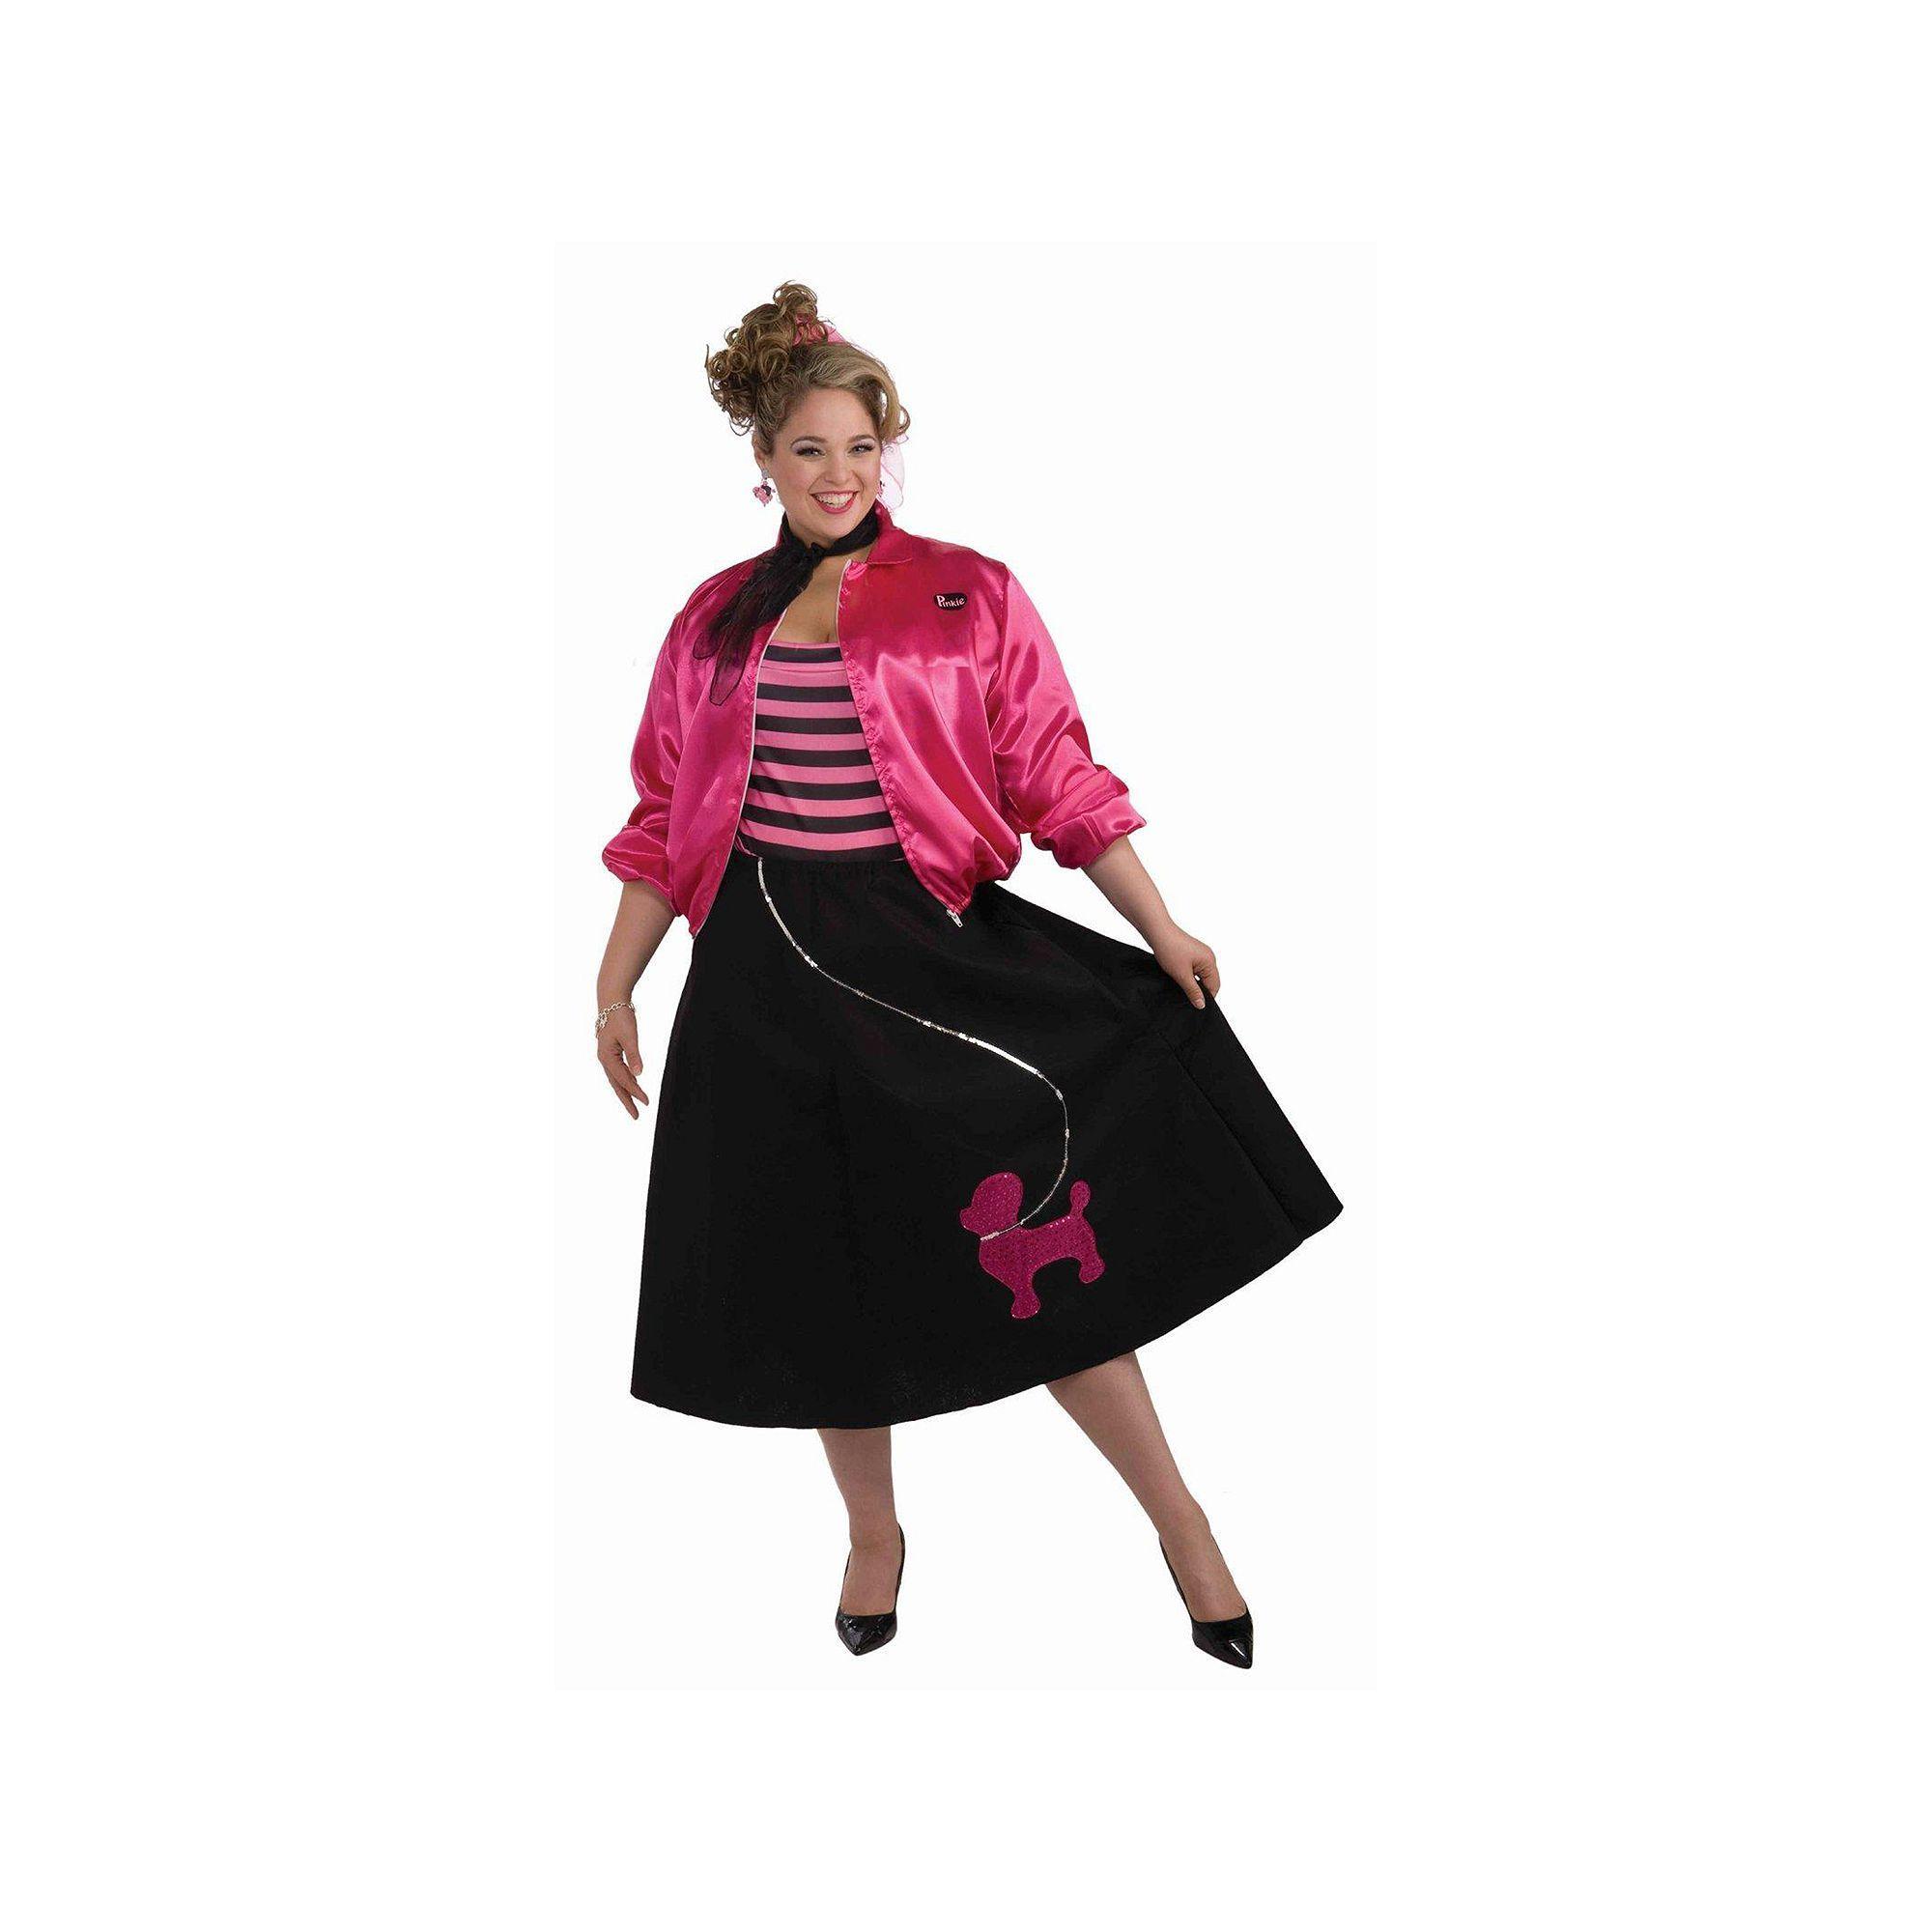 Plus Size Poodle Skirt Costume Set